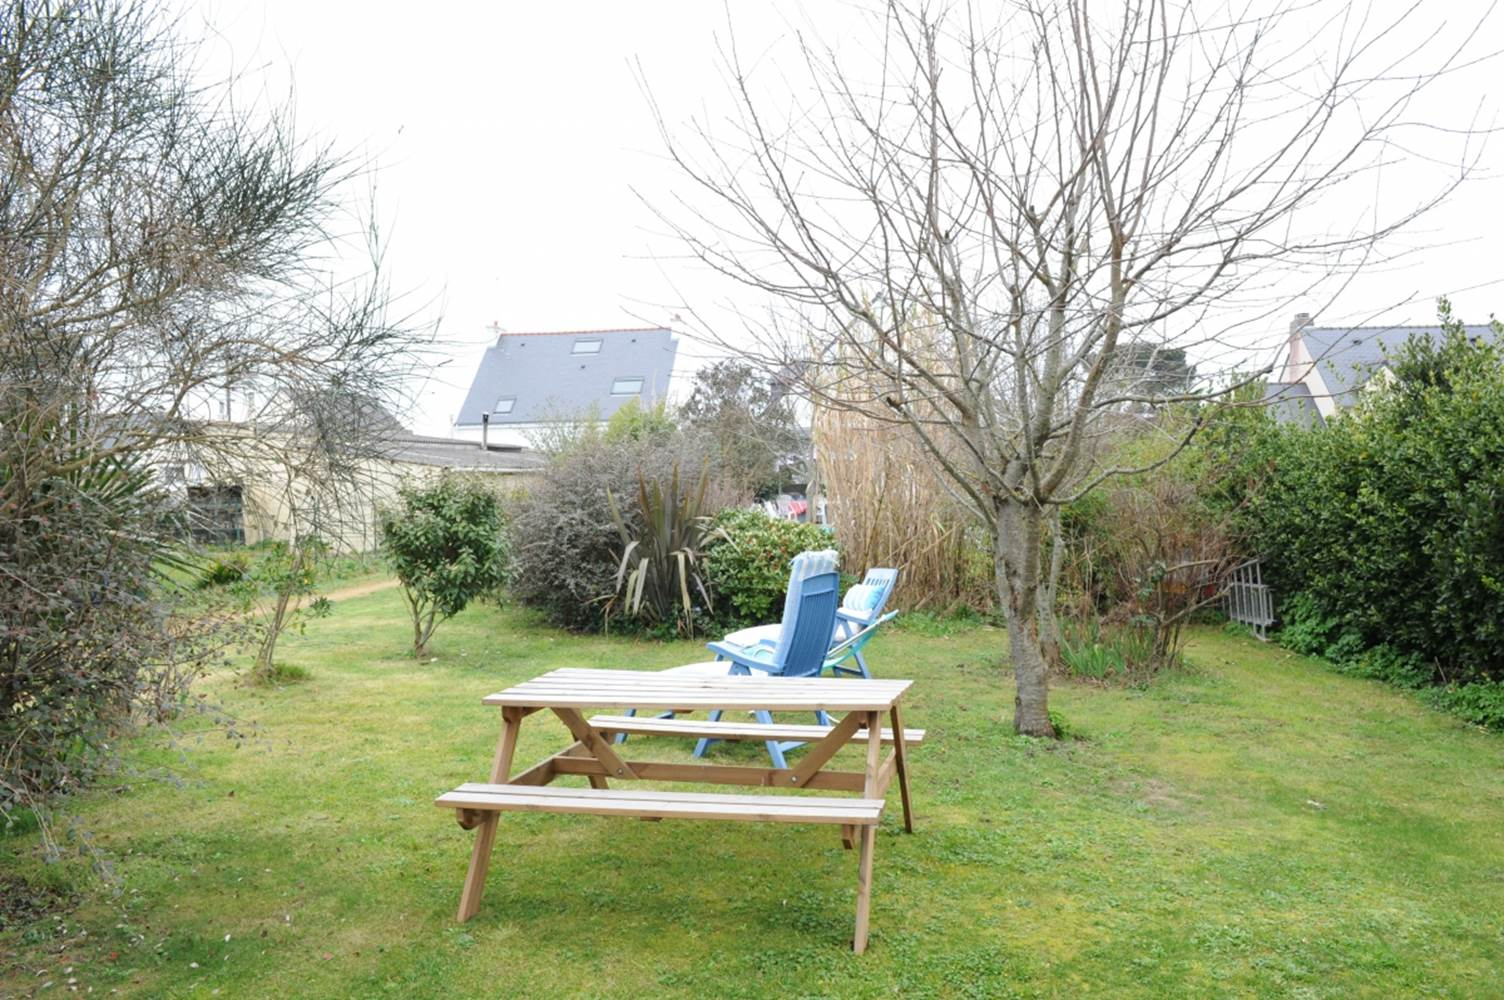 Gîte n°56G23412 – SAINT-PIERRE-QUIBERON – Morbihan Bretagne Sud © GITES DE France 56